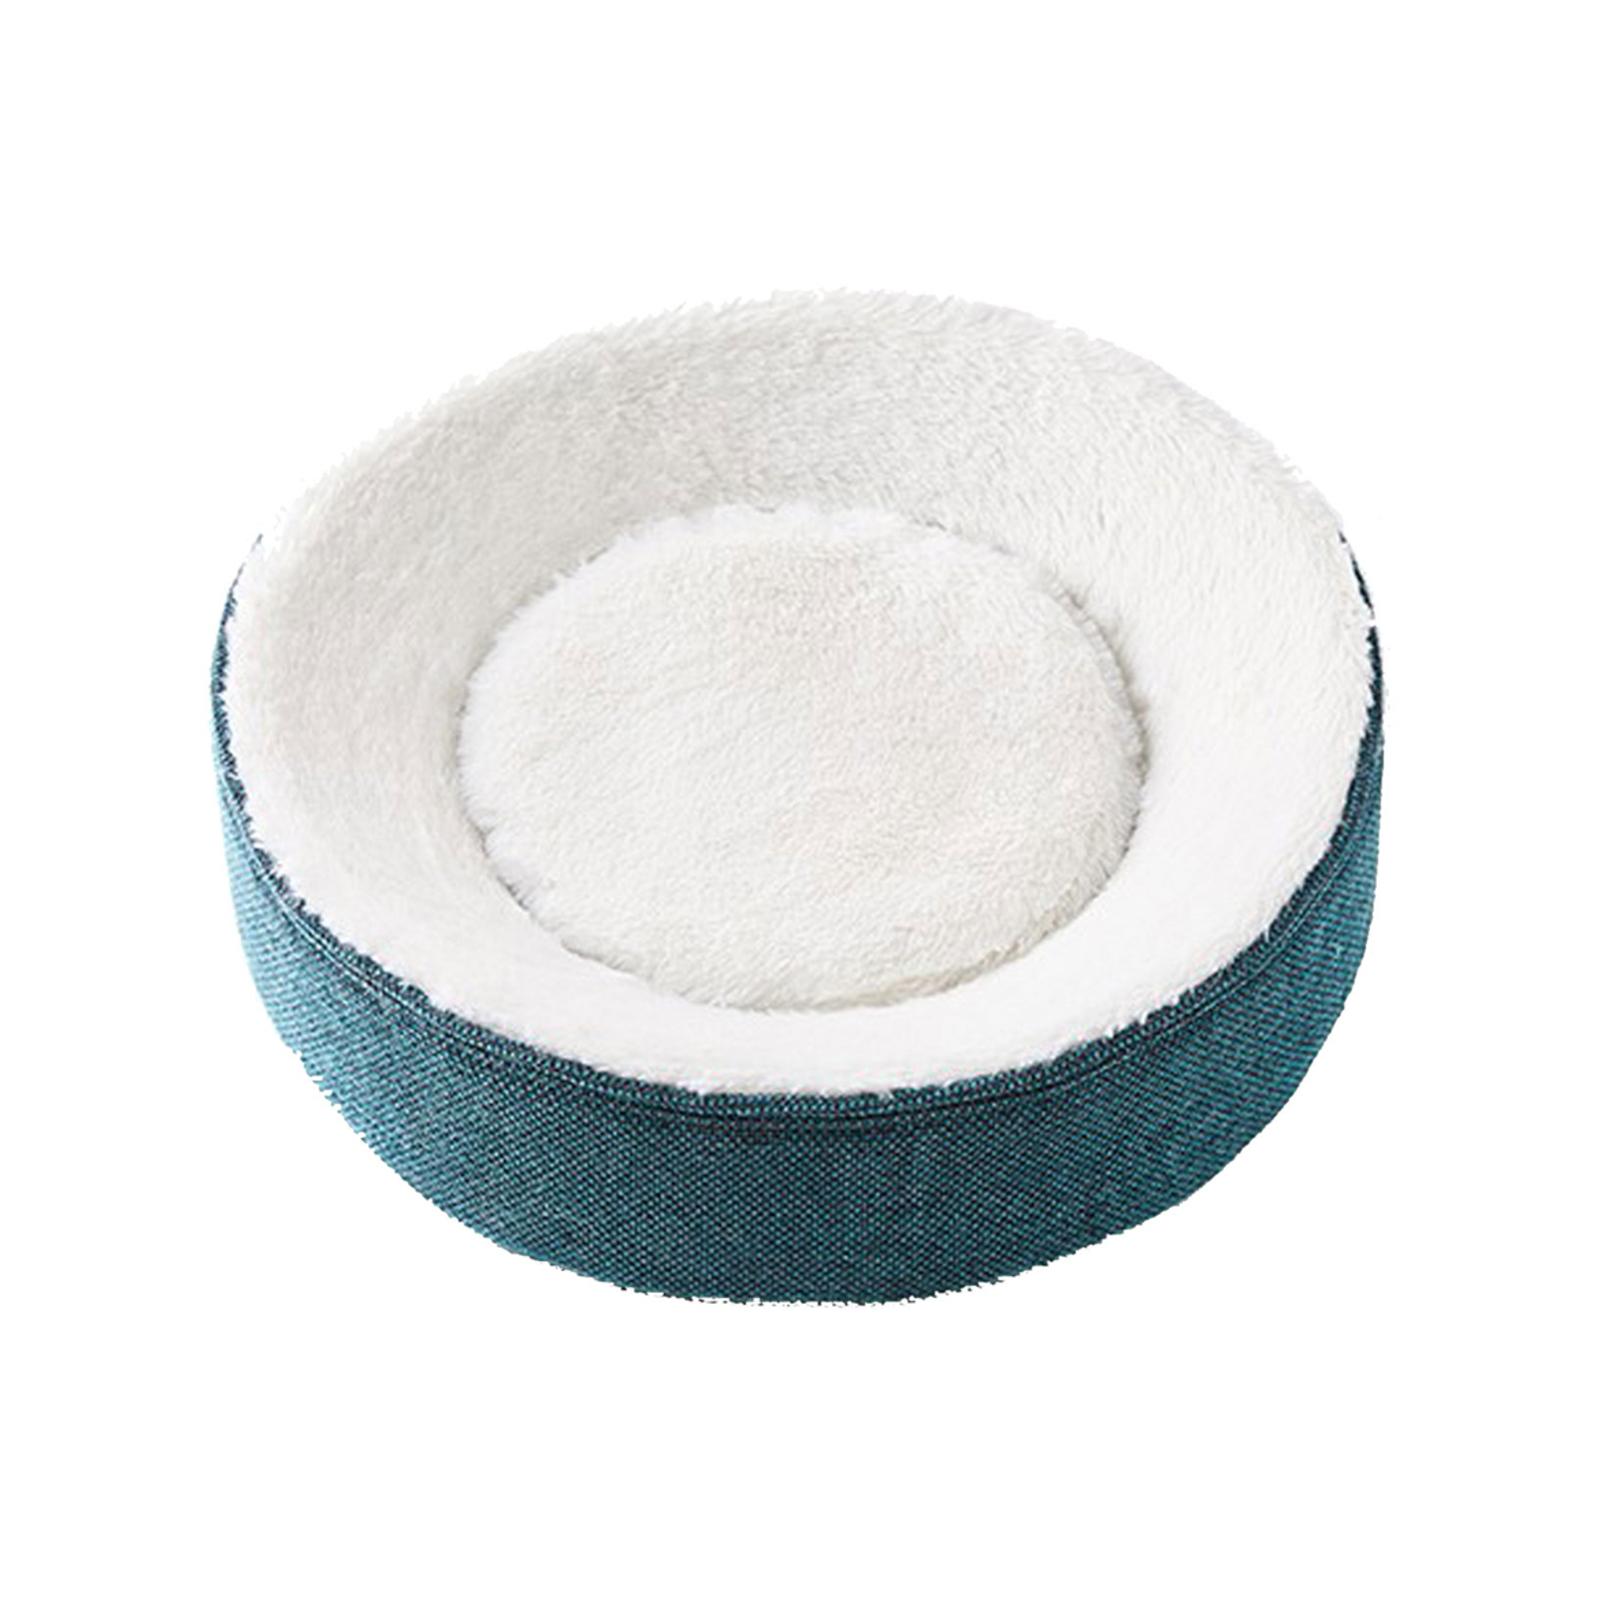 Petkit Deep Sleep 41cm Cat/Kitten/Pet Memory Foam Curved/Round Bed Warm/Cozy GRN